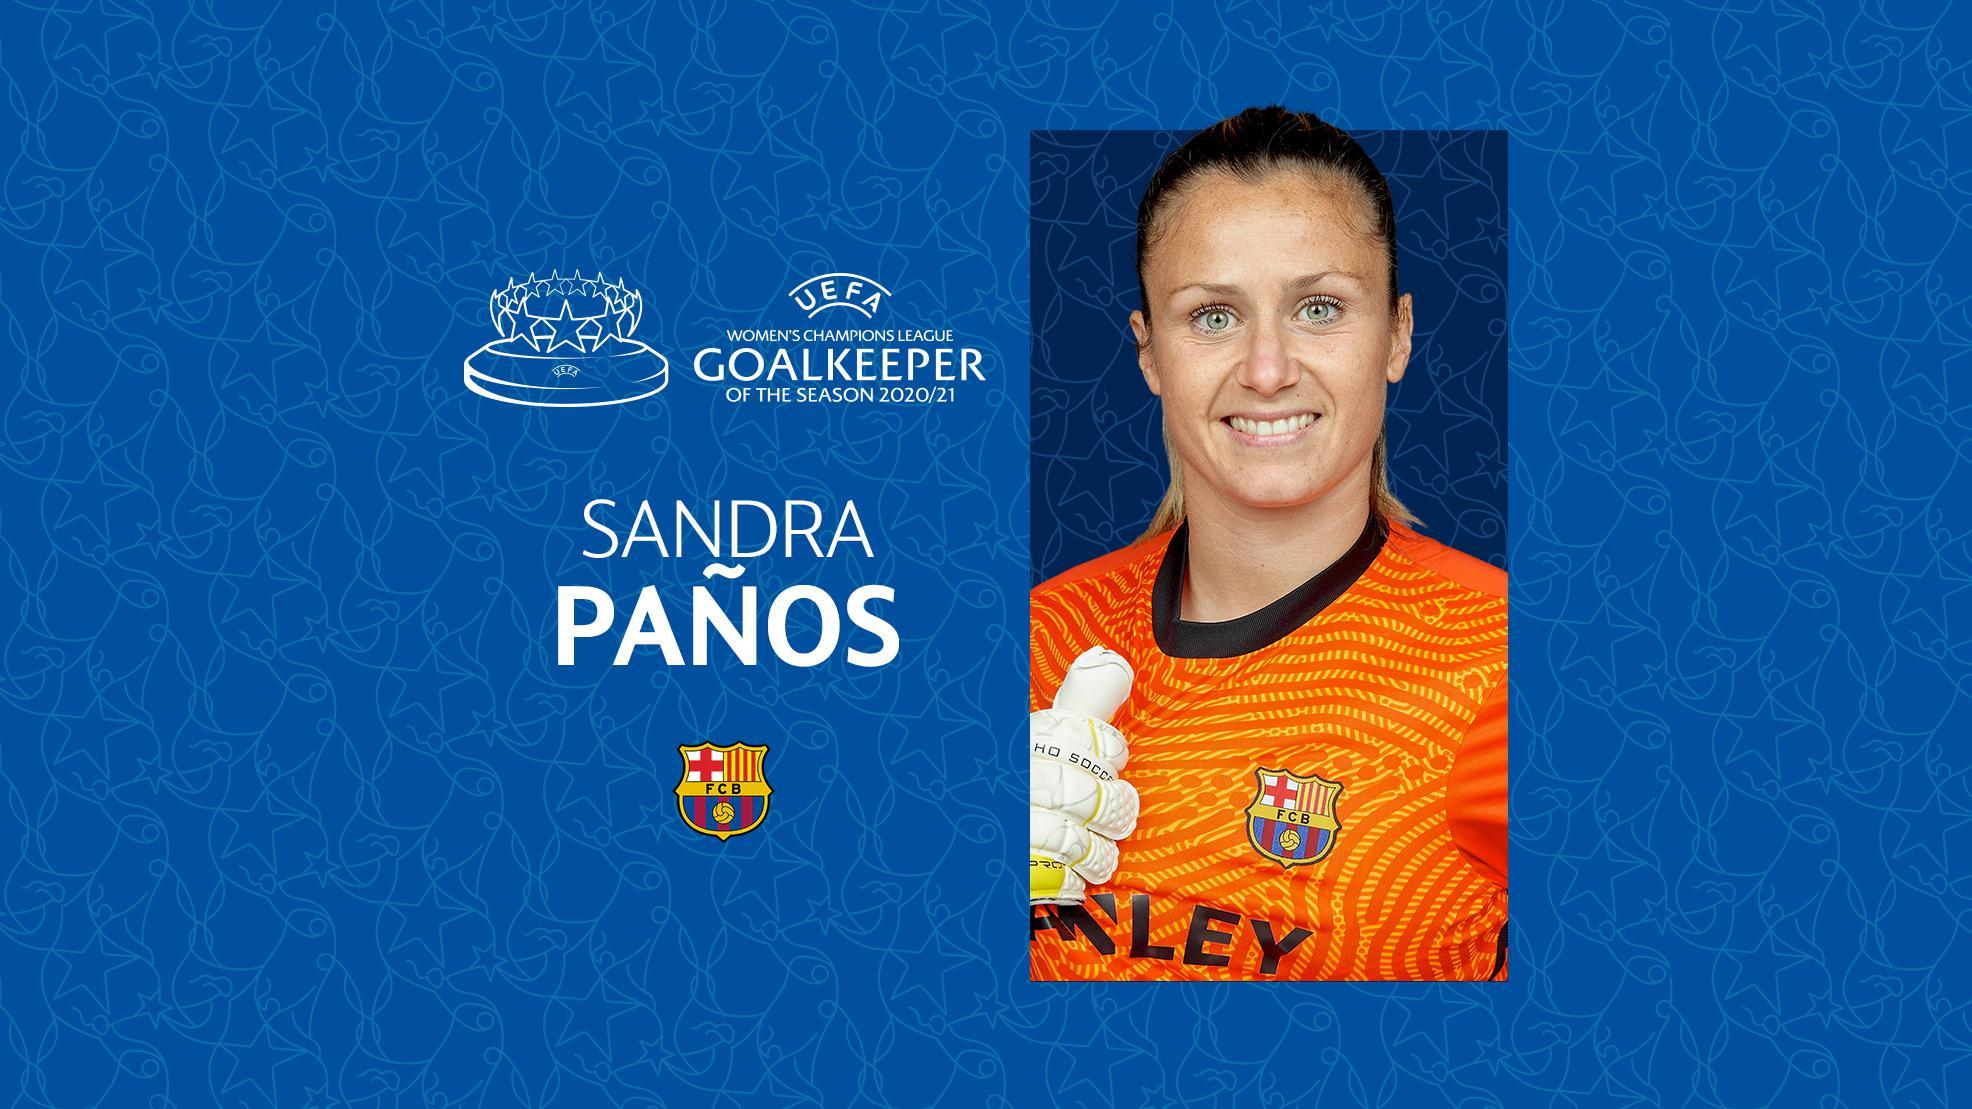 Сандра Паньос